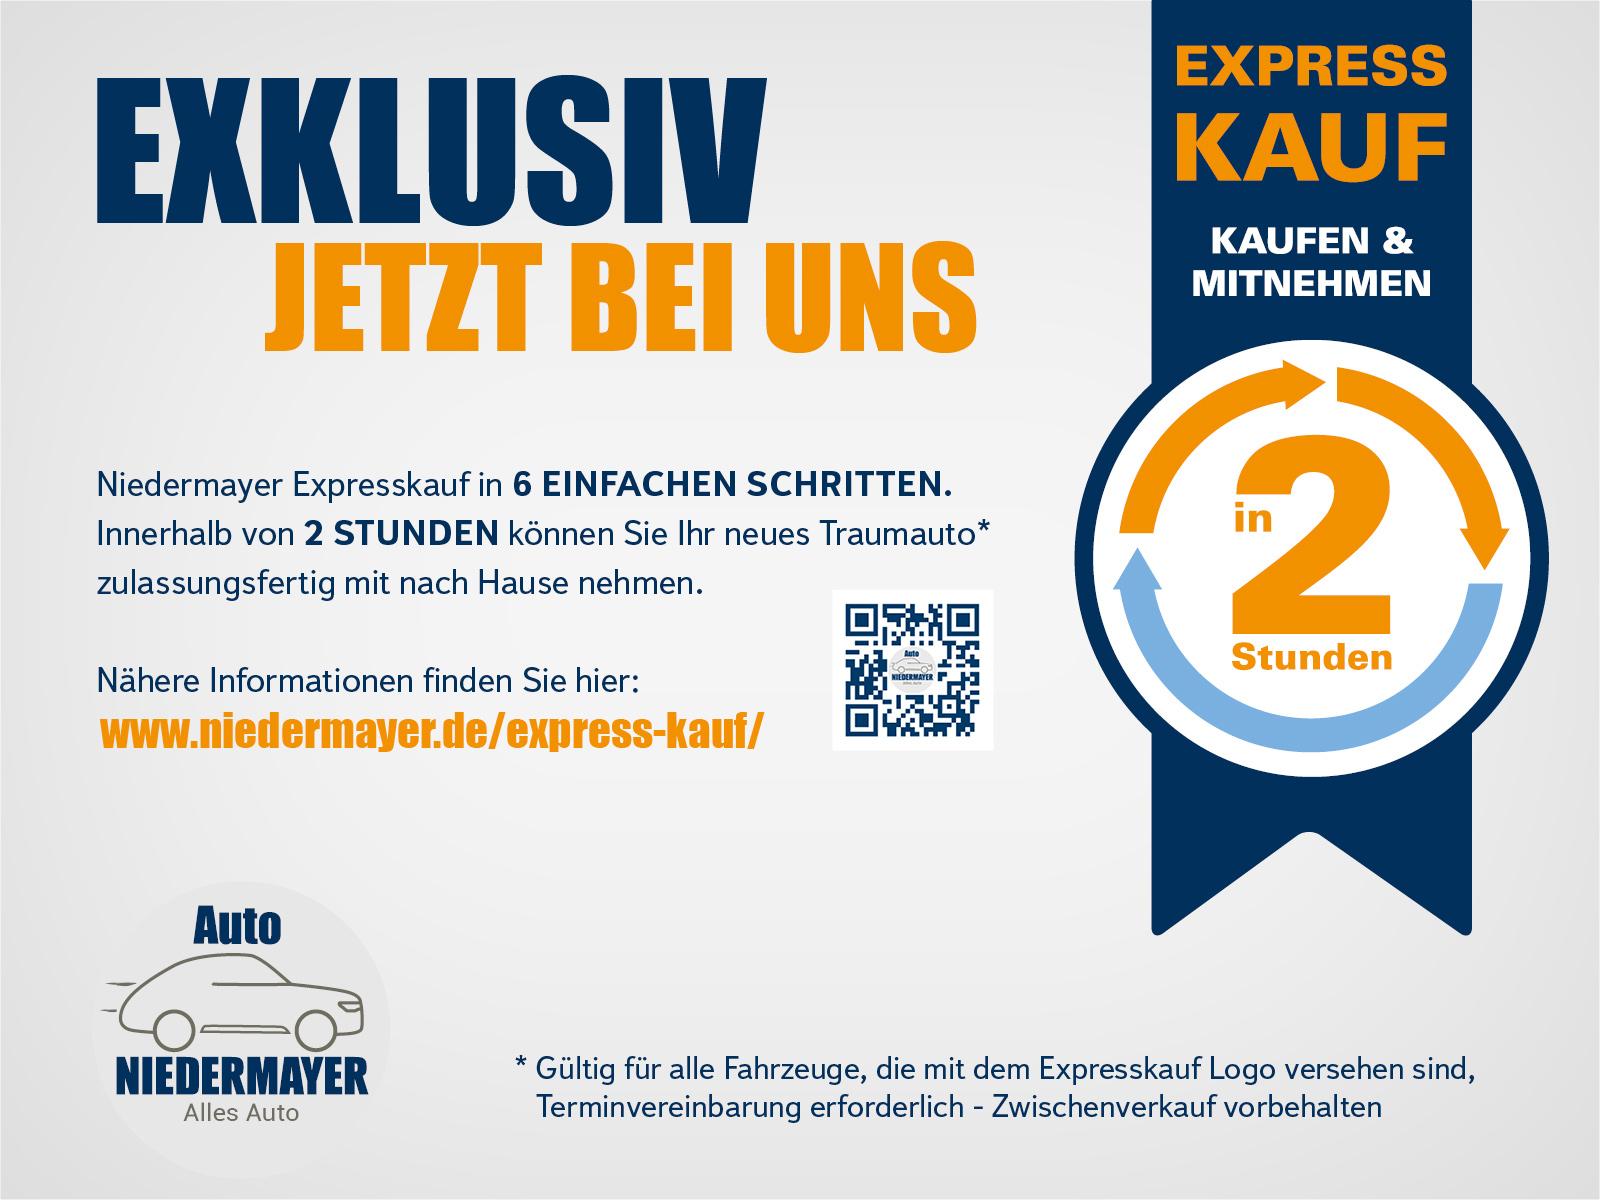 SKODA KAROQ 1.6 TDI Ambition, Navi, DAB, Sitzheizung, 17-Zoll, sofort Auto Niedermayer B2B, D-94362 Neukirchen